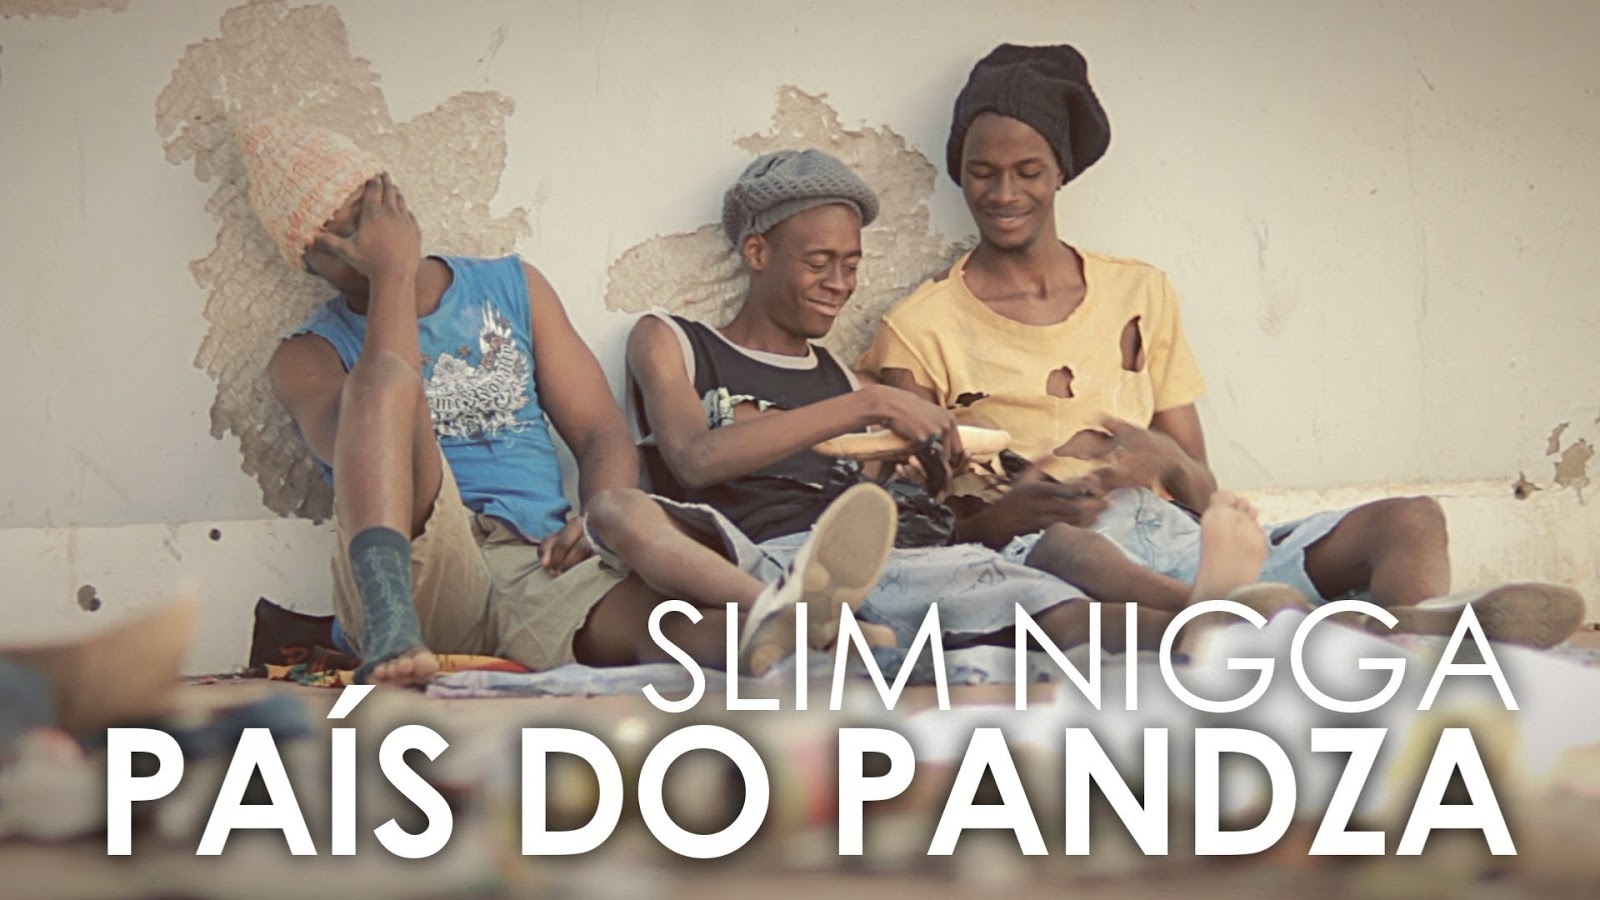 MaciaDownloads : Slim Nigga - País do Pandza | 2012